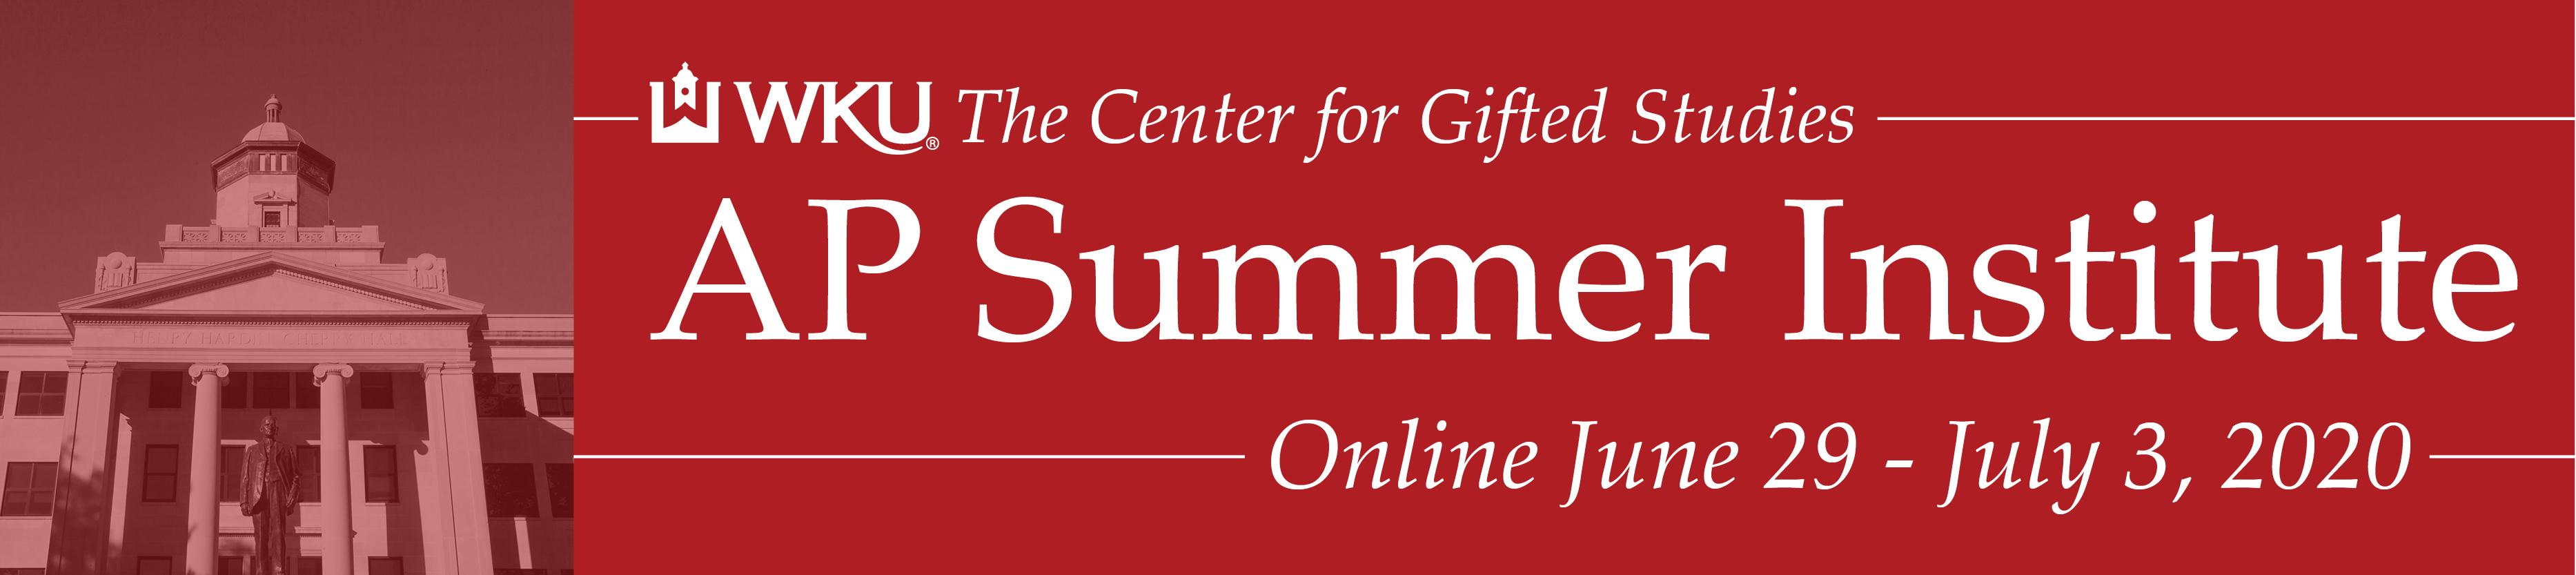 Western Kentucky University AP Summer Institute 2020 Online - Week 2